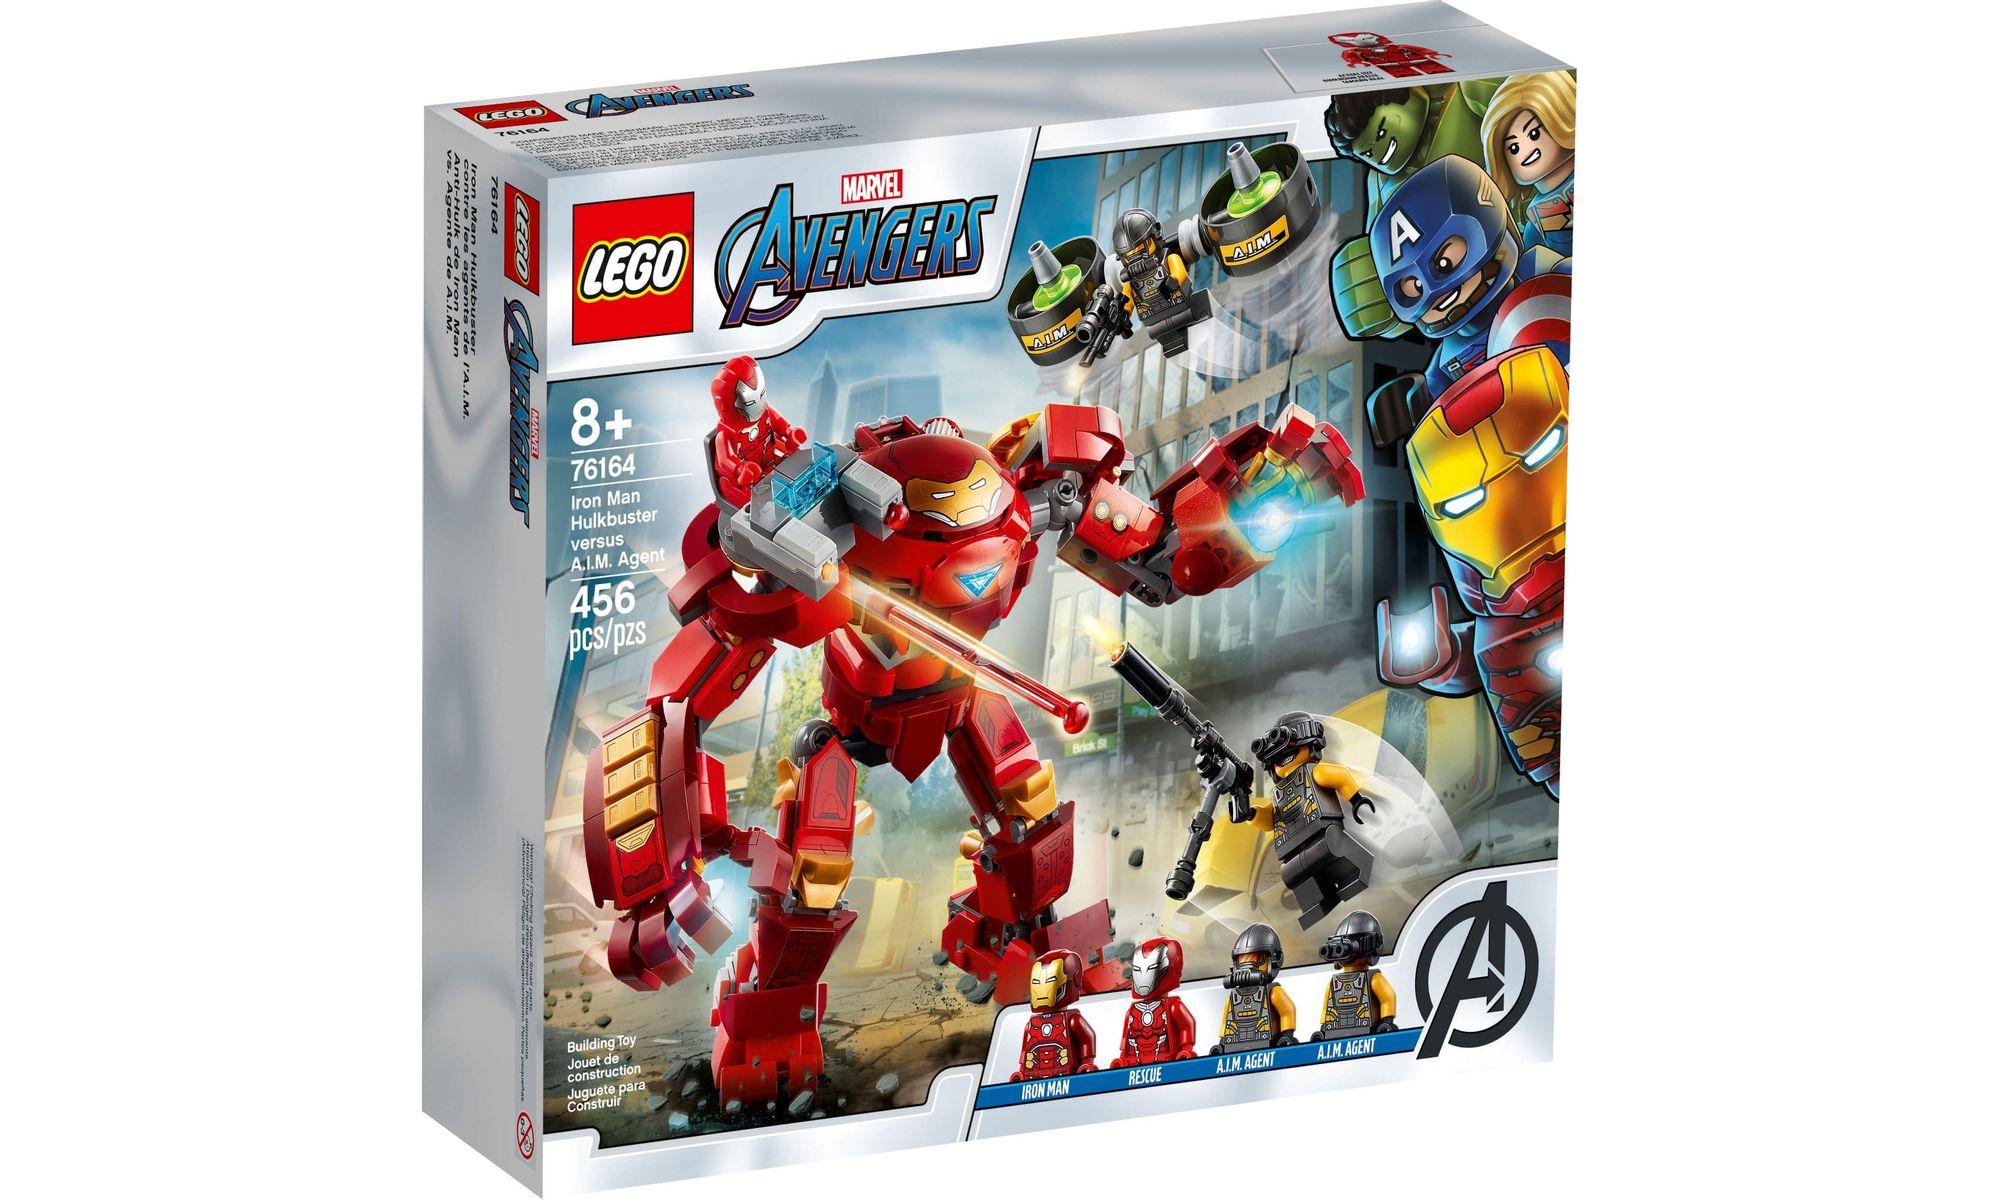 LEGO Marvel 76164 - Homem de Ferro Hulkbuster Agente A.I.M